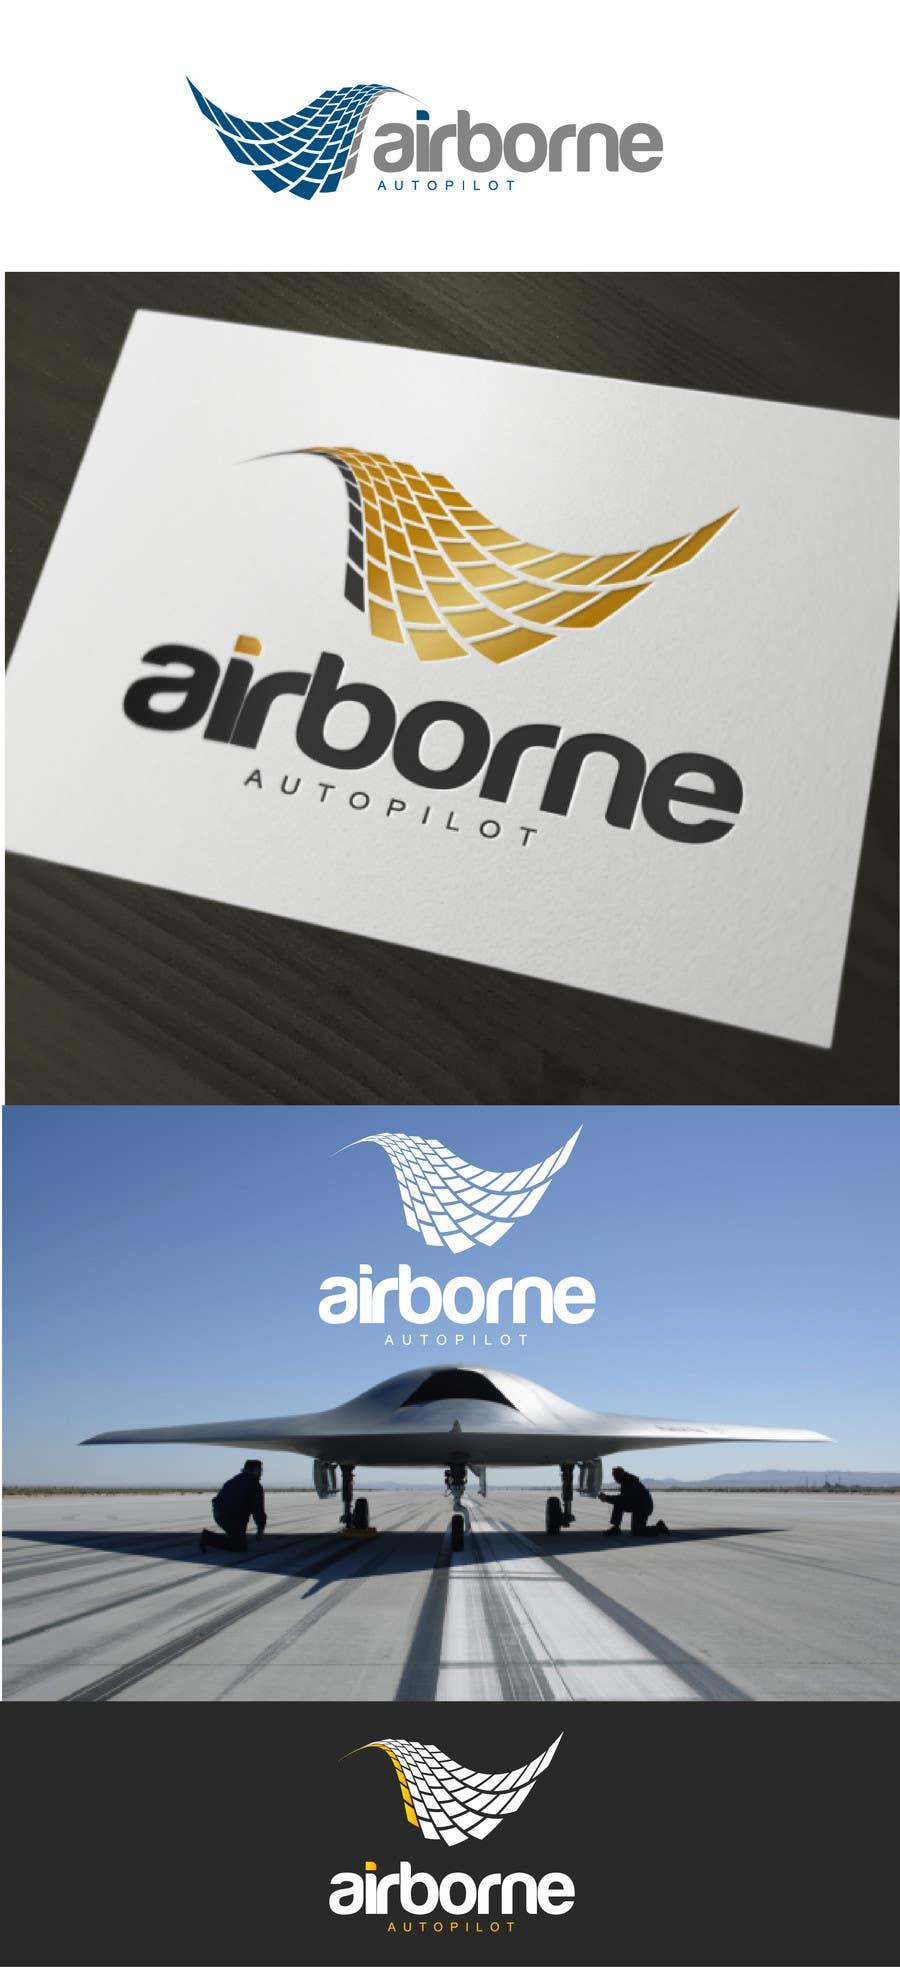 Bài tham dự cuộc thi #50 cho Design a brand name and logo for an autopilot